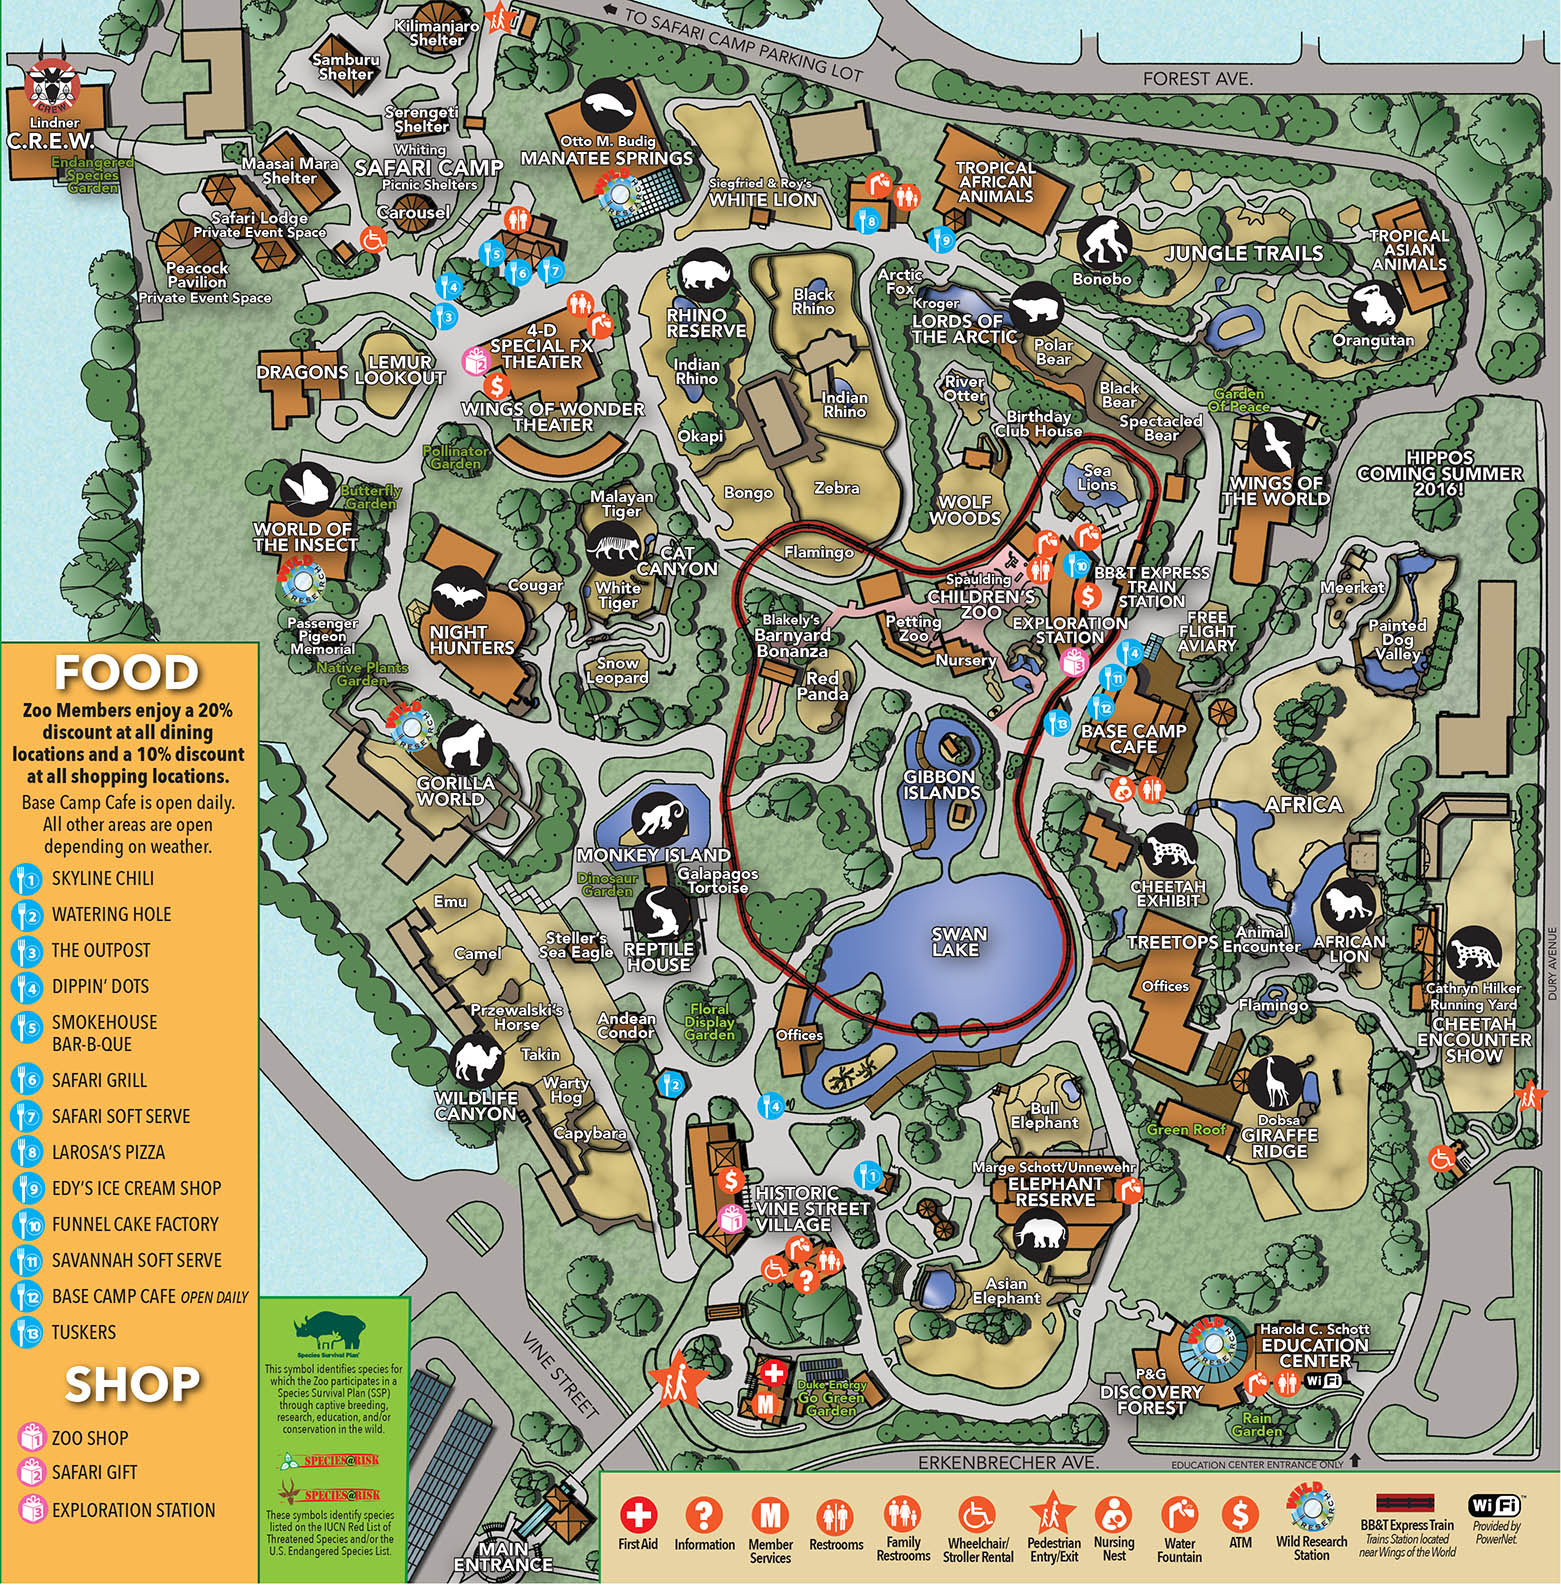 columbus zoo map 2016 bnhspinecom